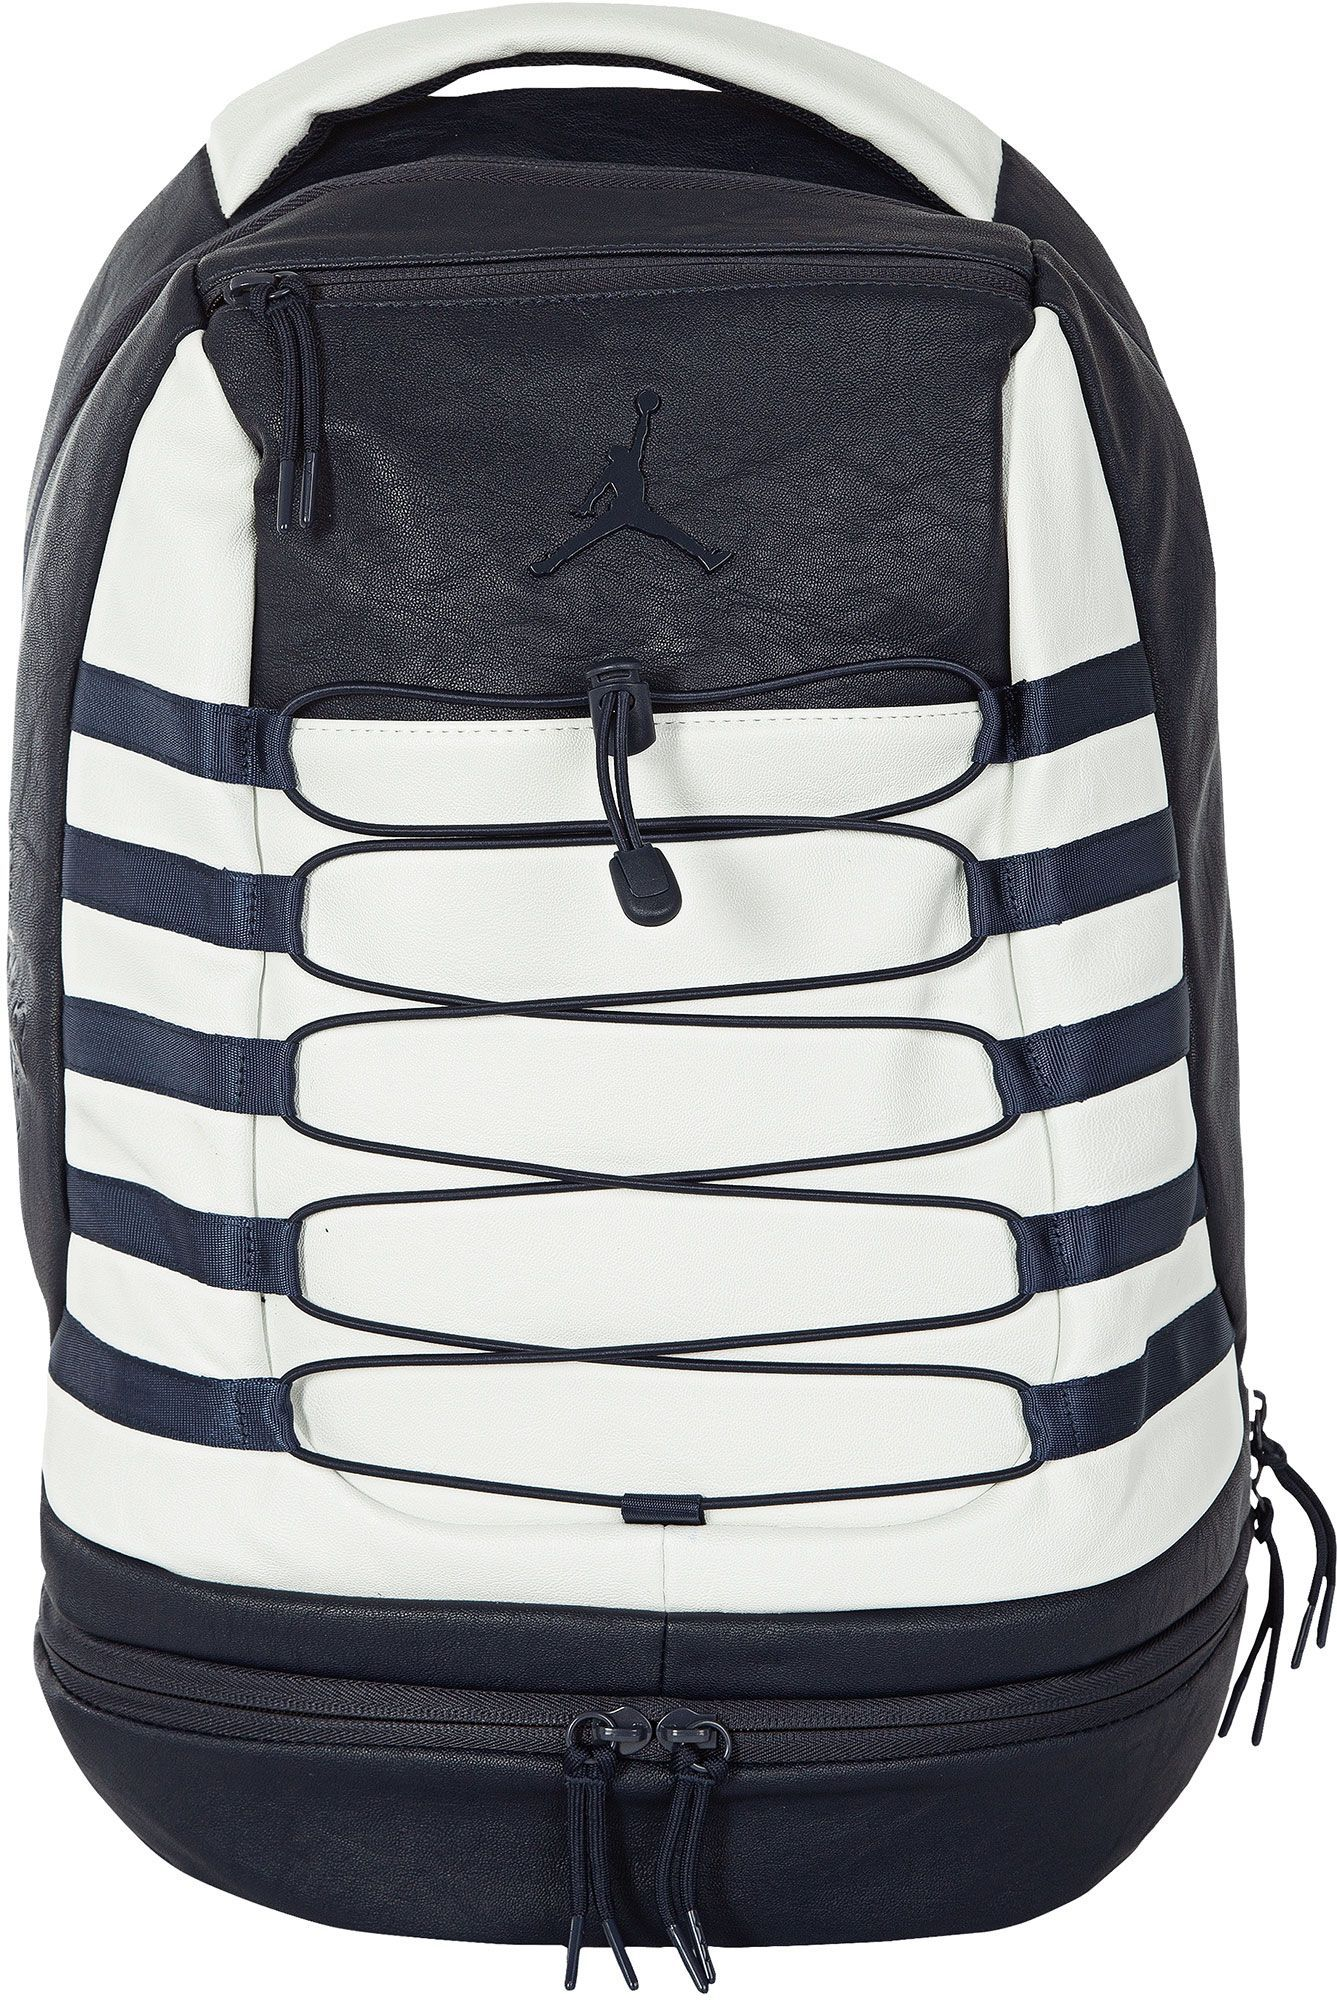 1df7d15f0560bc Jordan Retro 10 Backpack